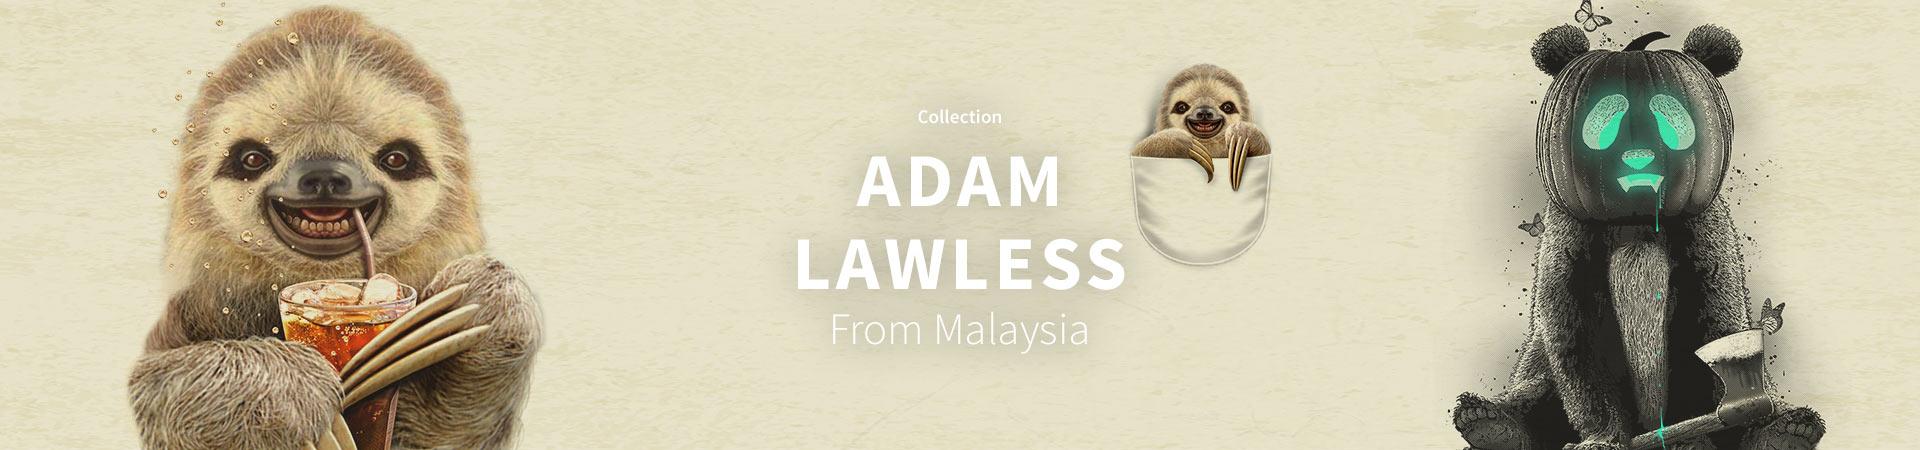 Adam Lawless